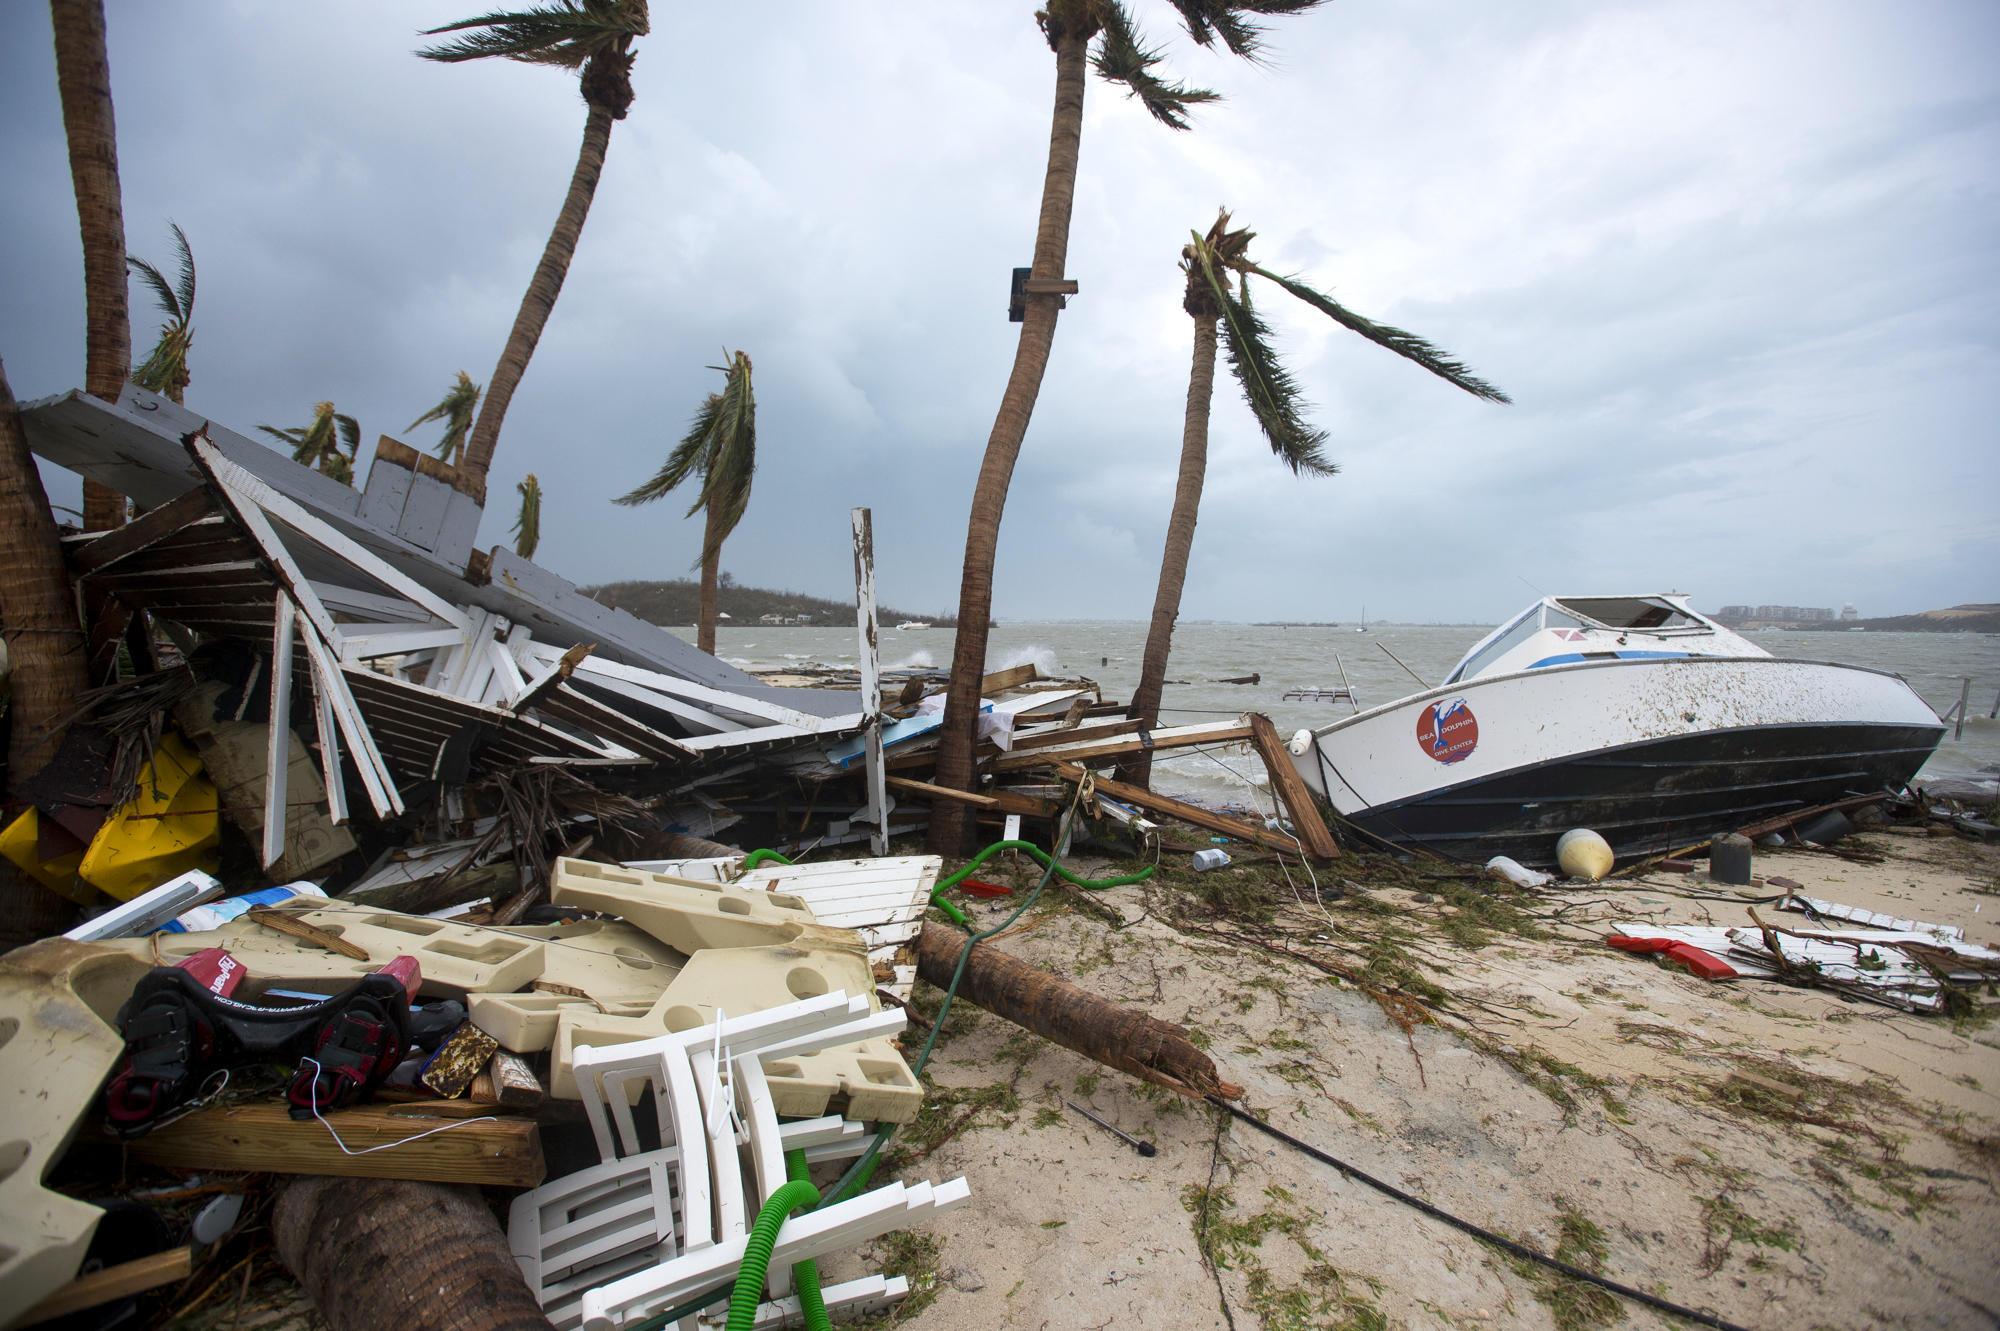 Uragano Irma, la devastazione ai Caraibi